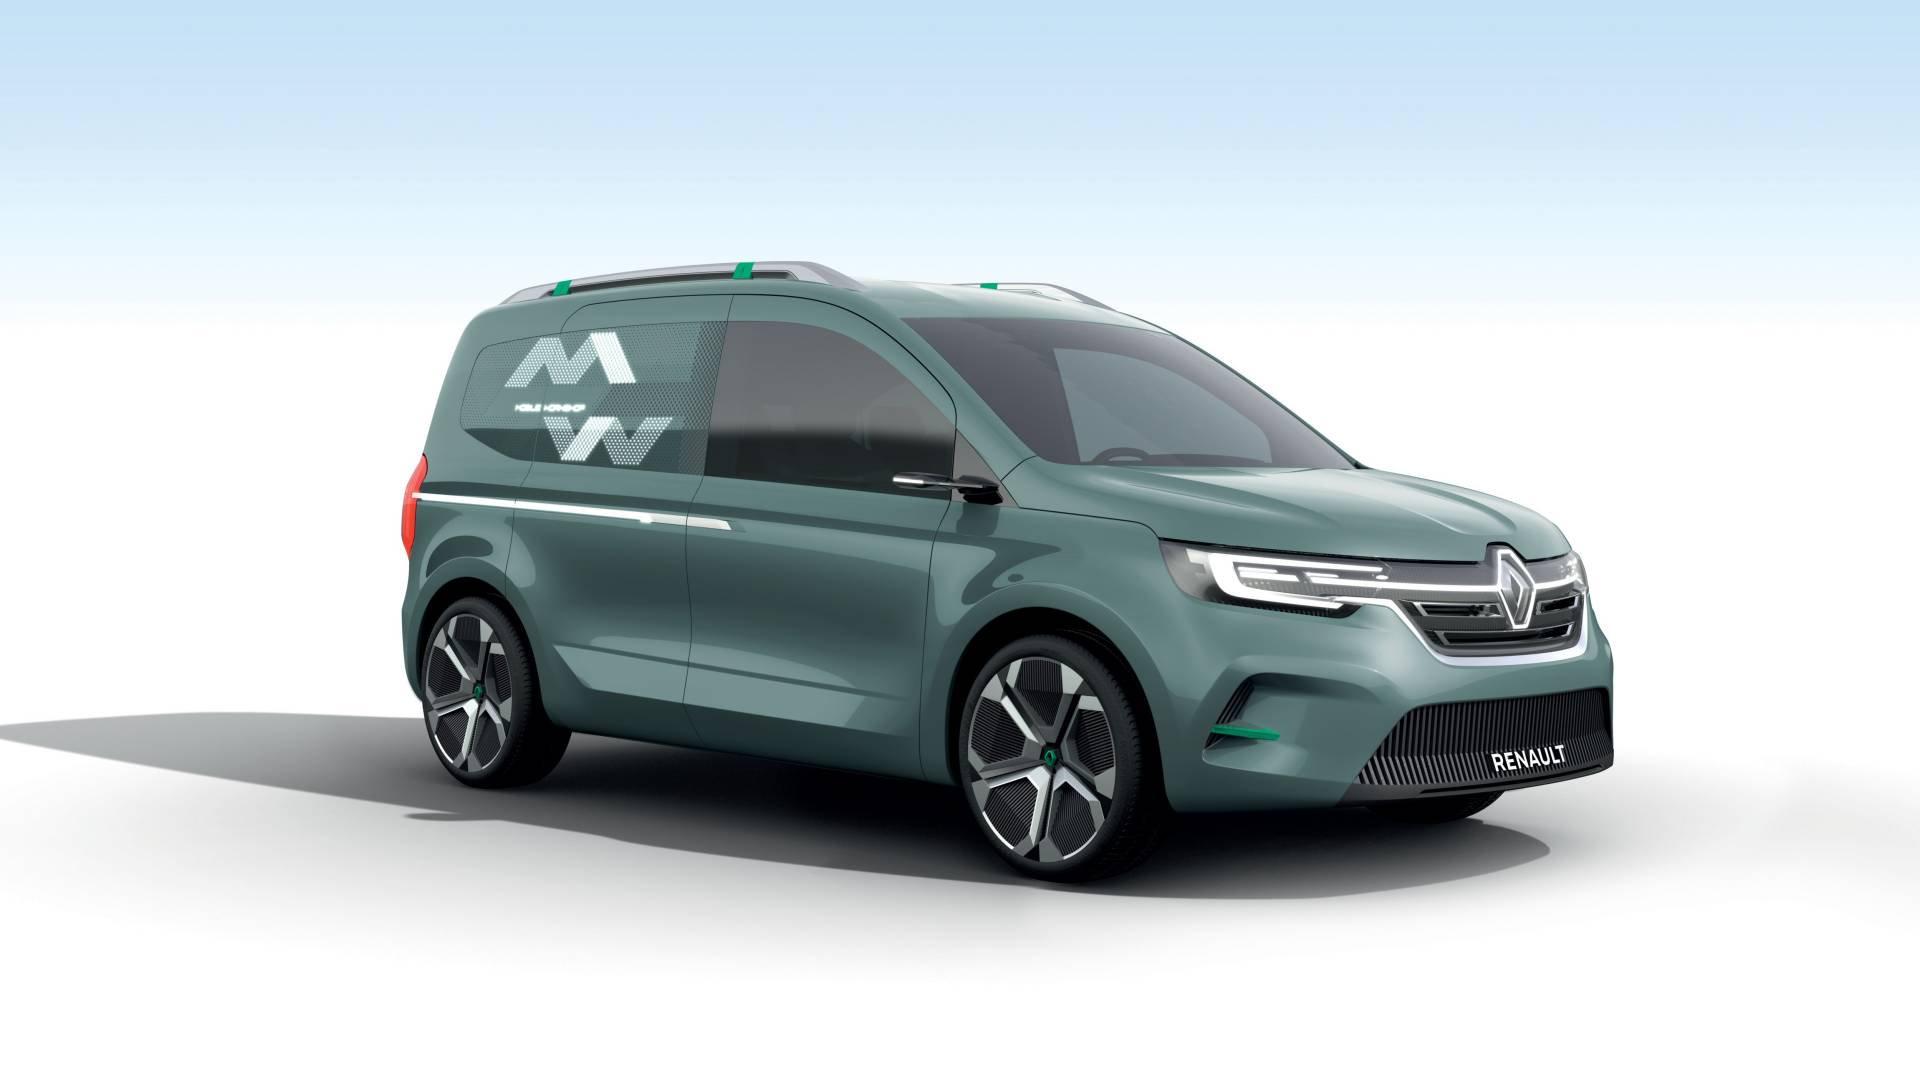 New Renault Kangoo Z.E. Concept Previews 2020 Production ...